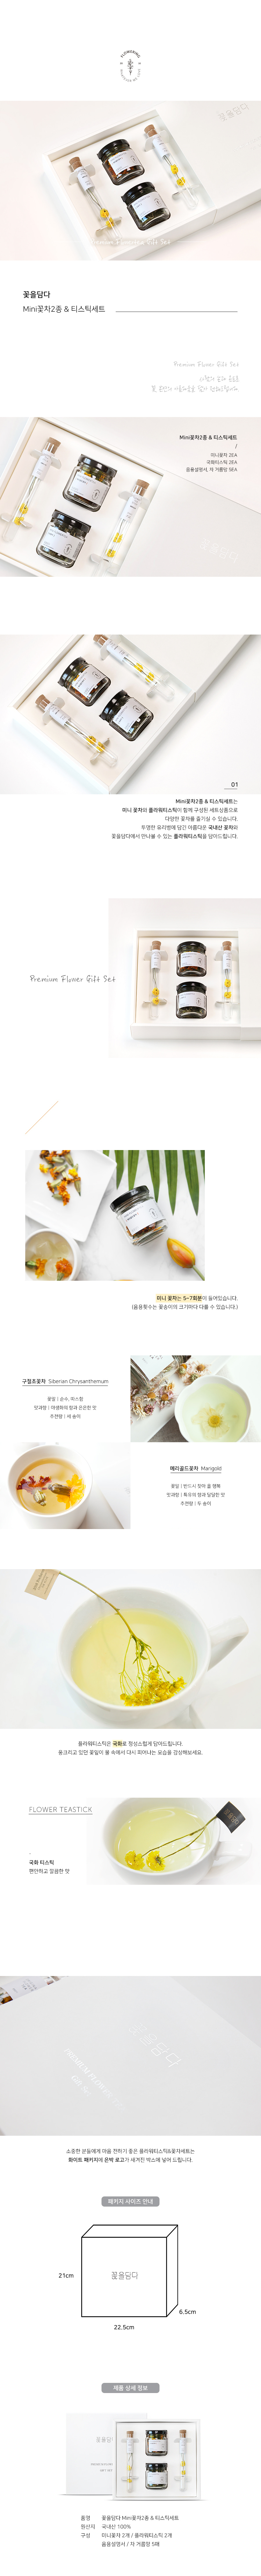 Mini 꽃차2종 & 티스틱세트